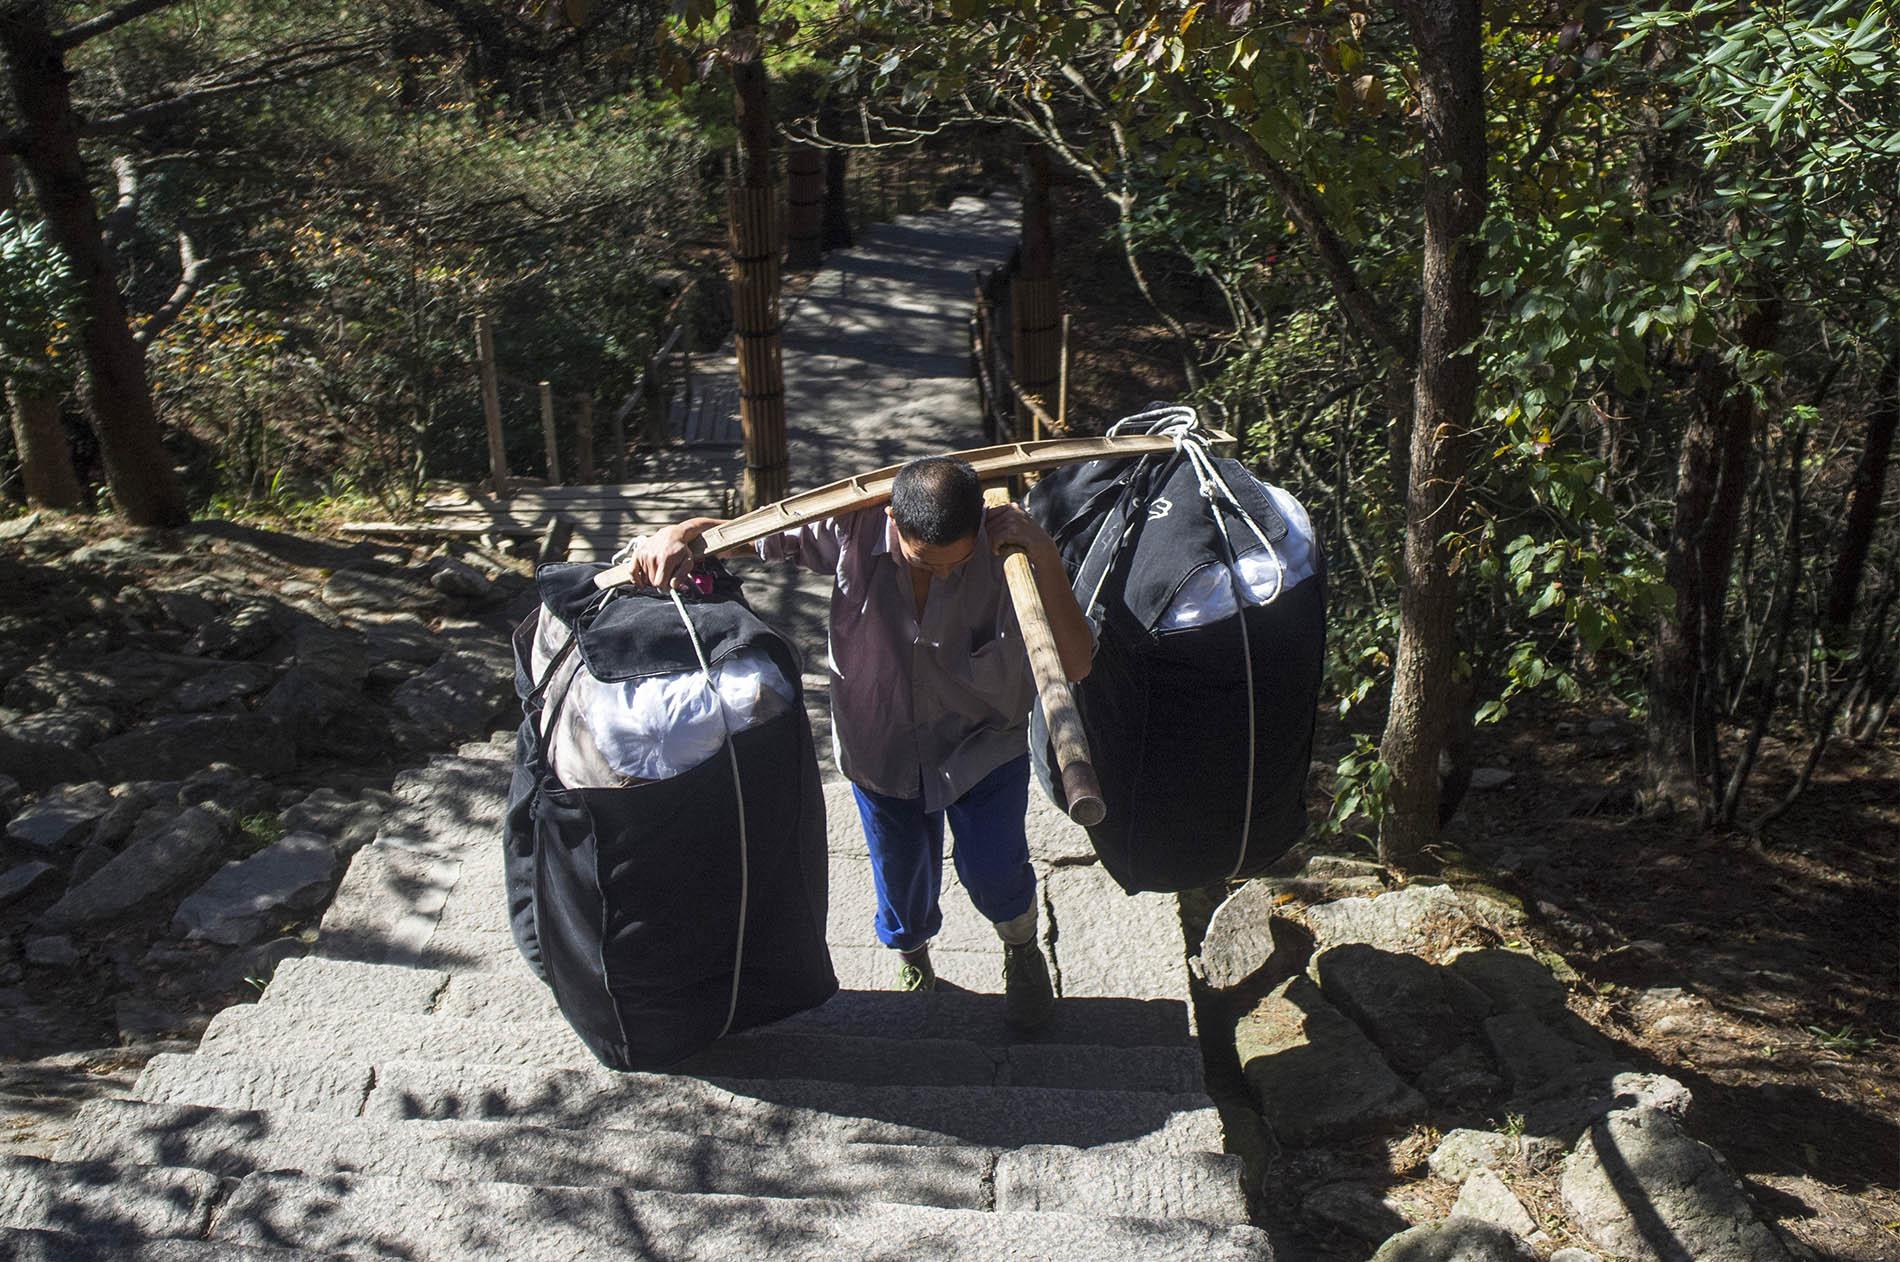 Man carrying tourists' bags.